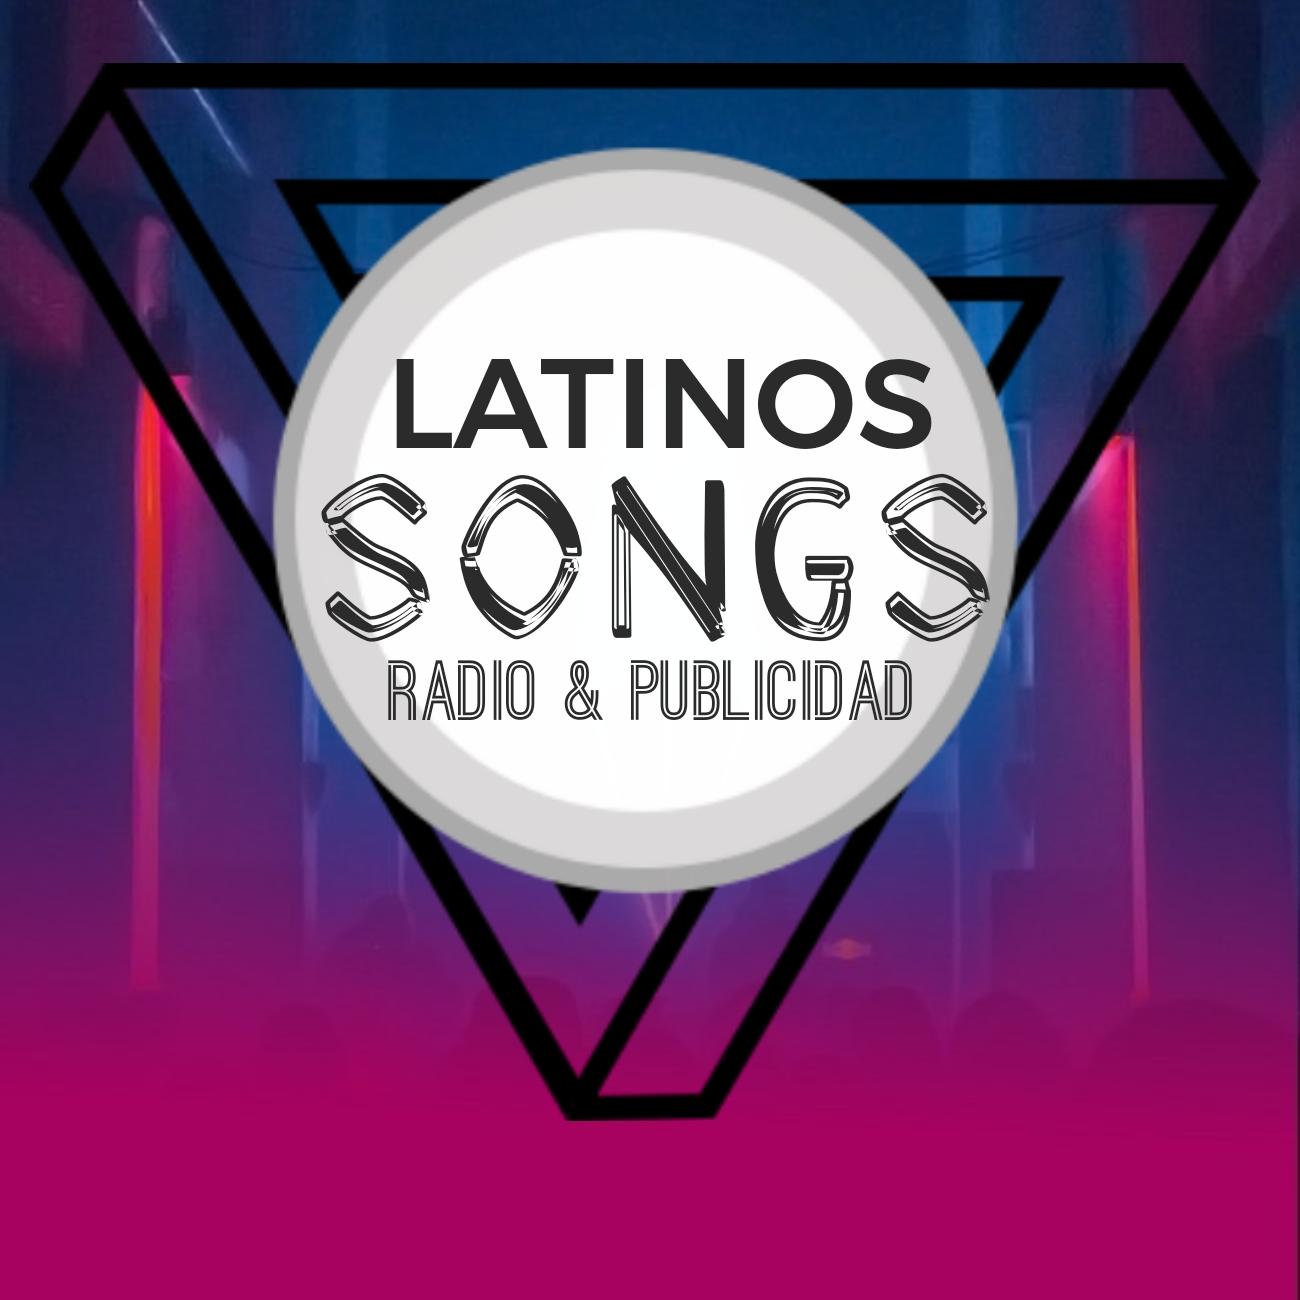 Latinos Songs Radio OnLine